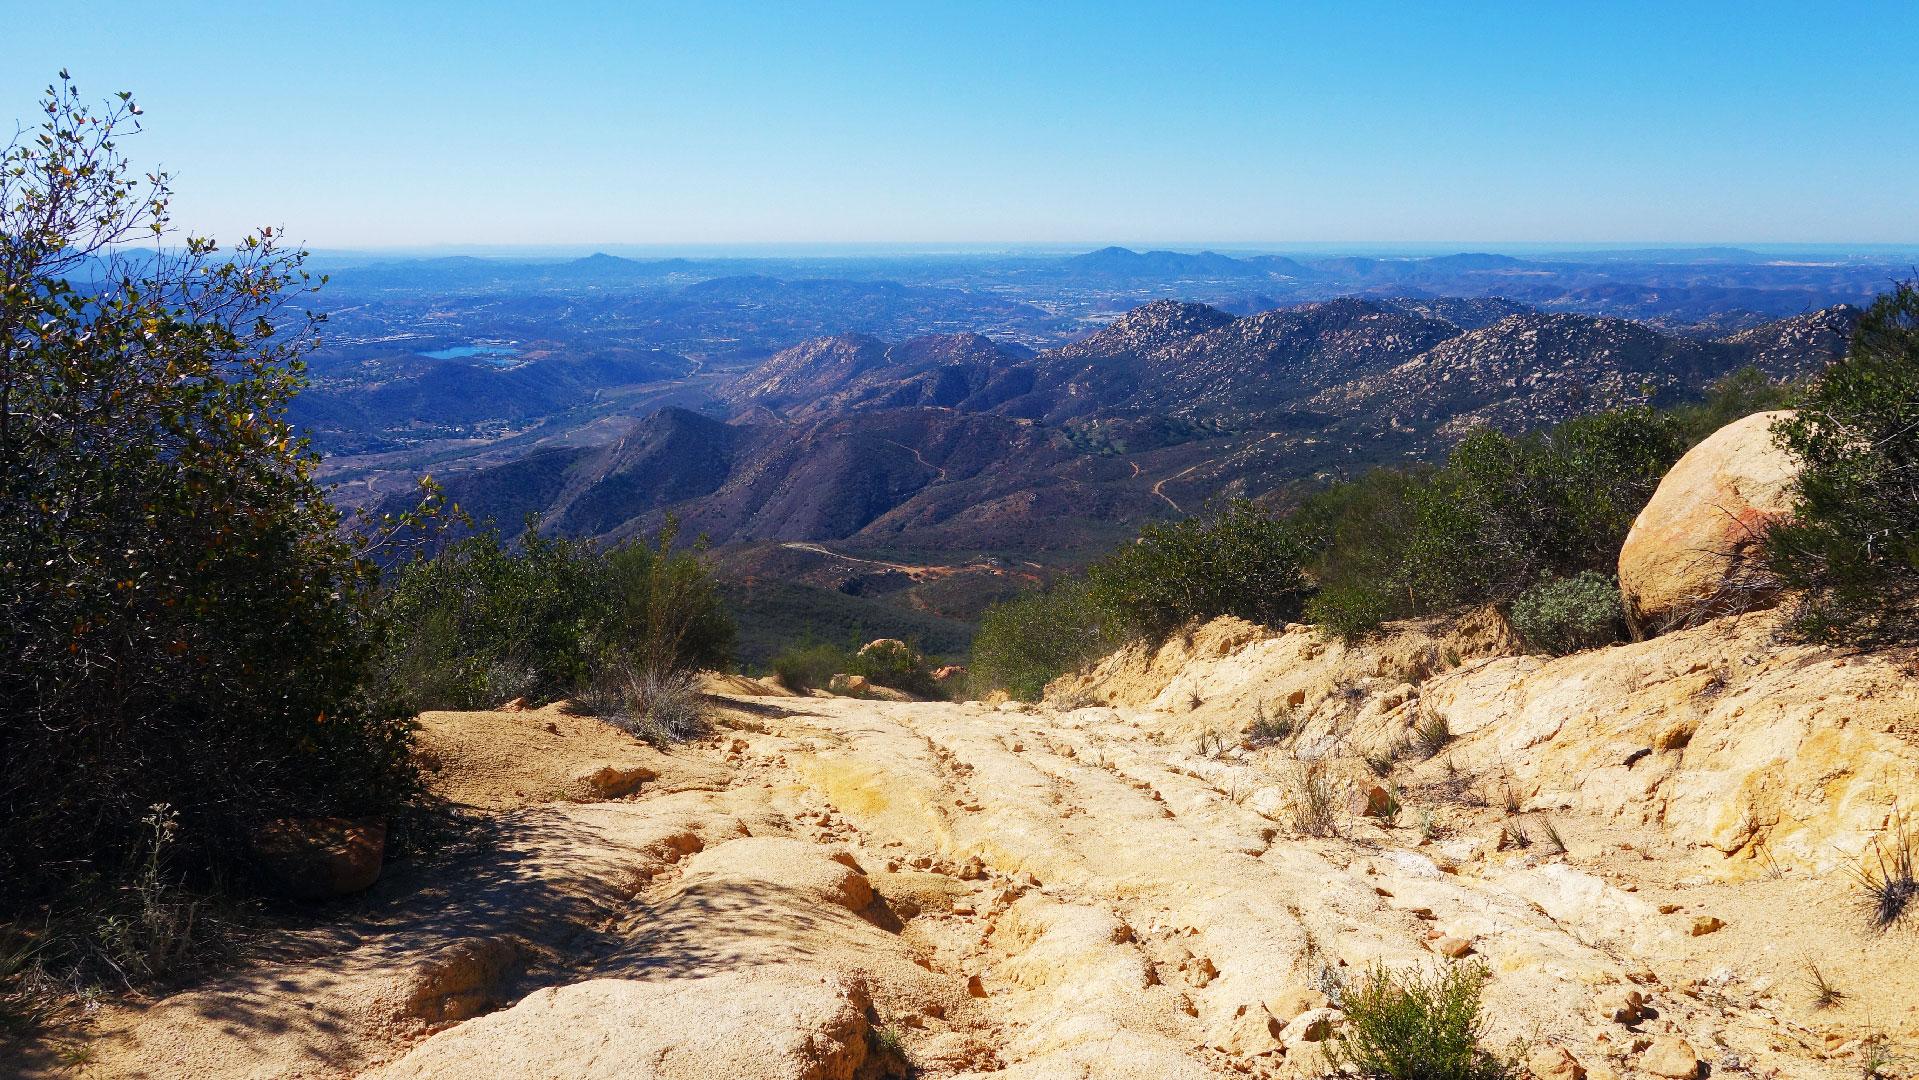 ... Rugged Trail Ahead On El Cajon Mountain ...